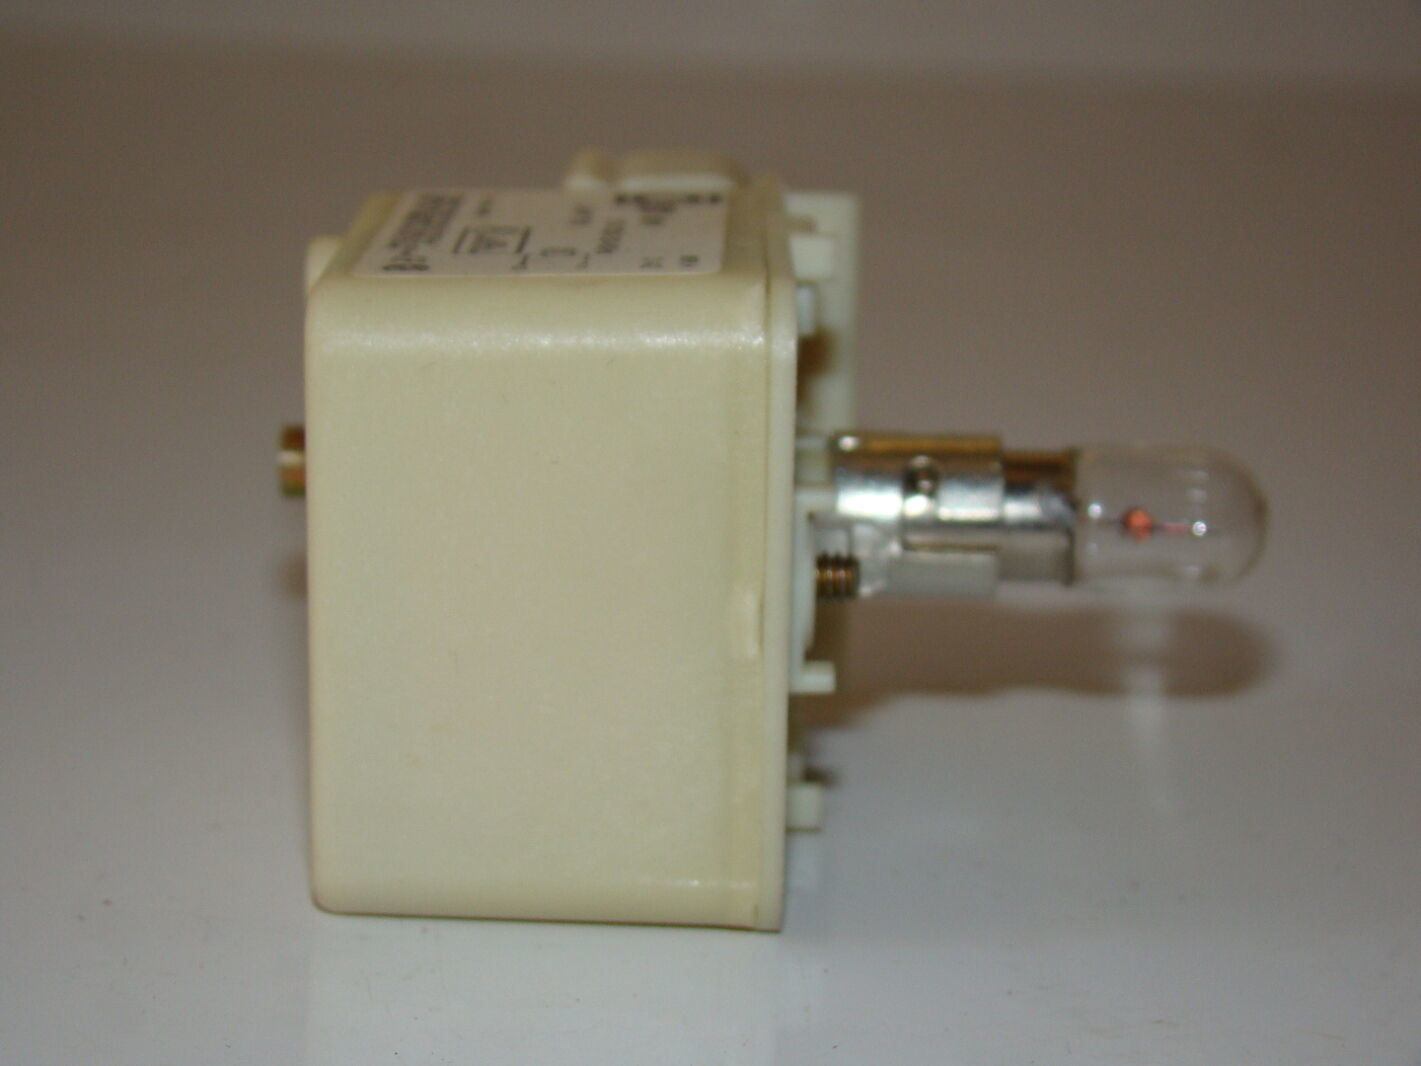 10x Square 8x8mm 6 Pin DPDT Mini Push Button Self-locking Multimeter Switches NJ